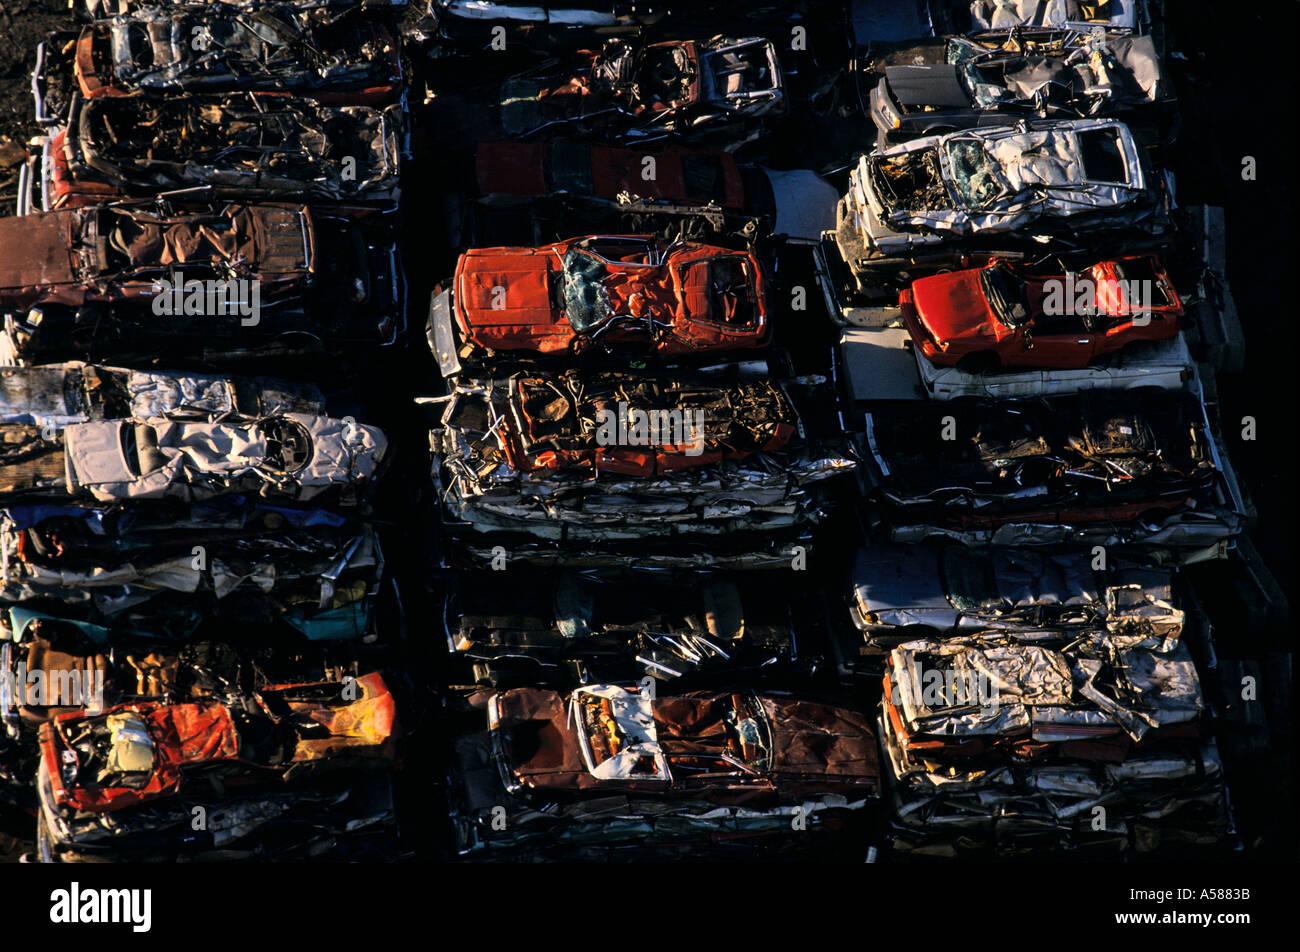 Overhead view of a scrap metal yard taken in Newark NJ - Stock Image